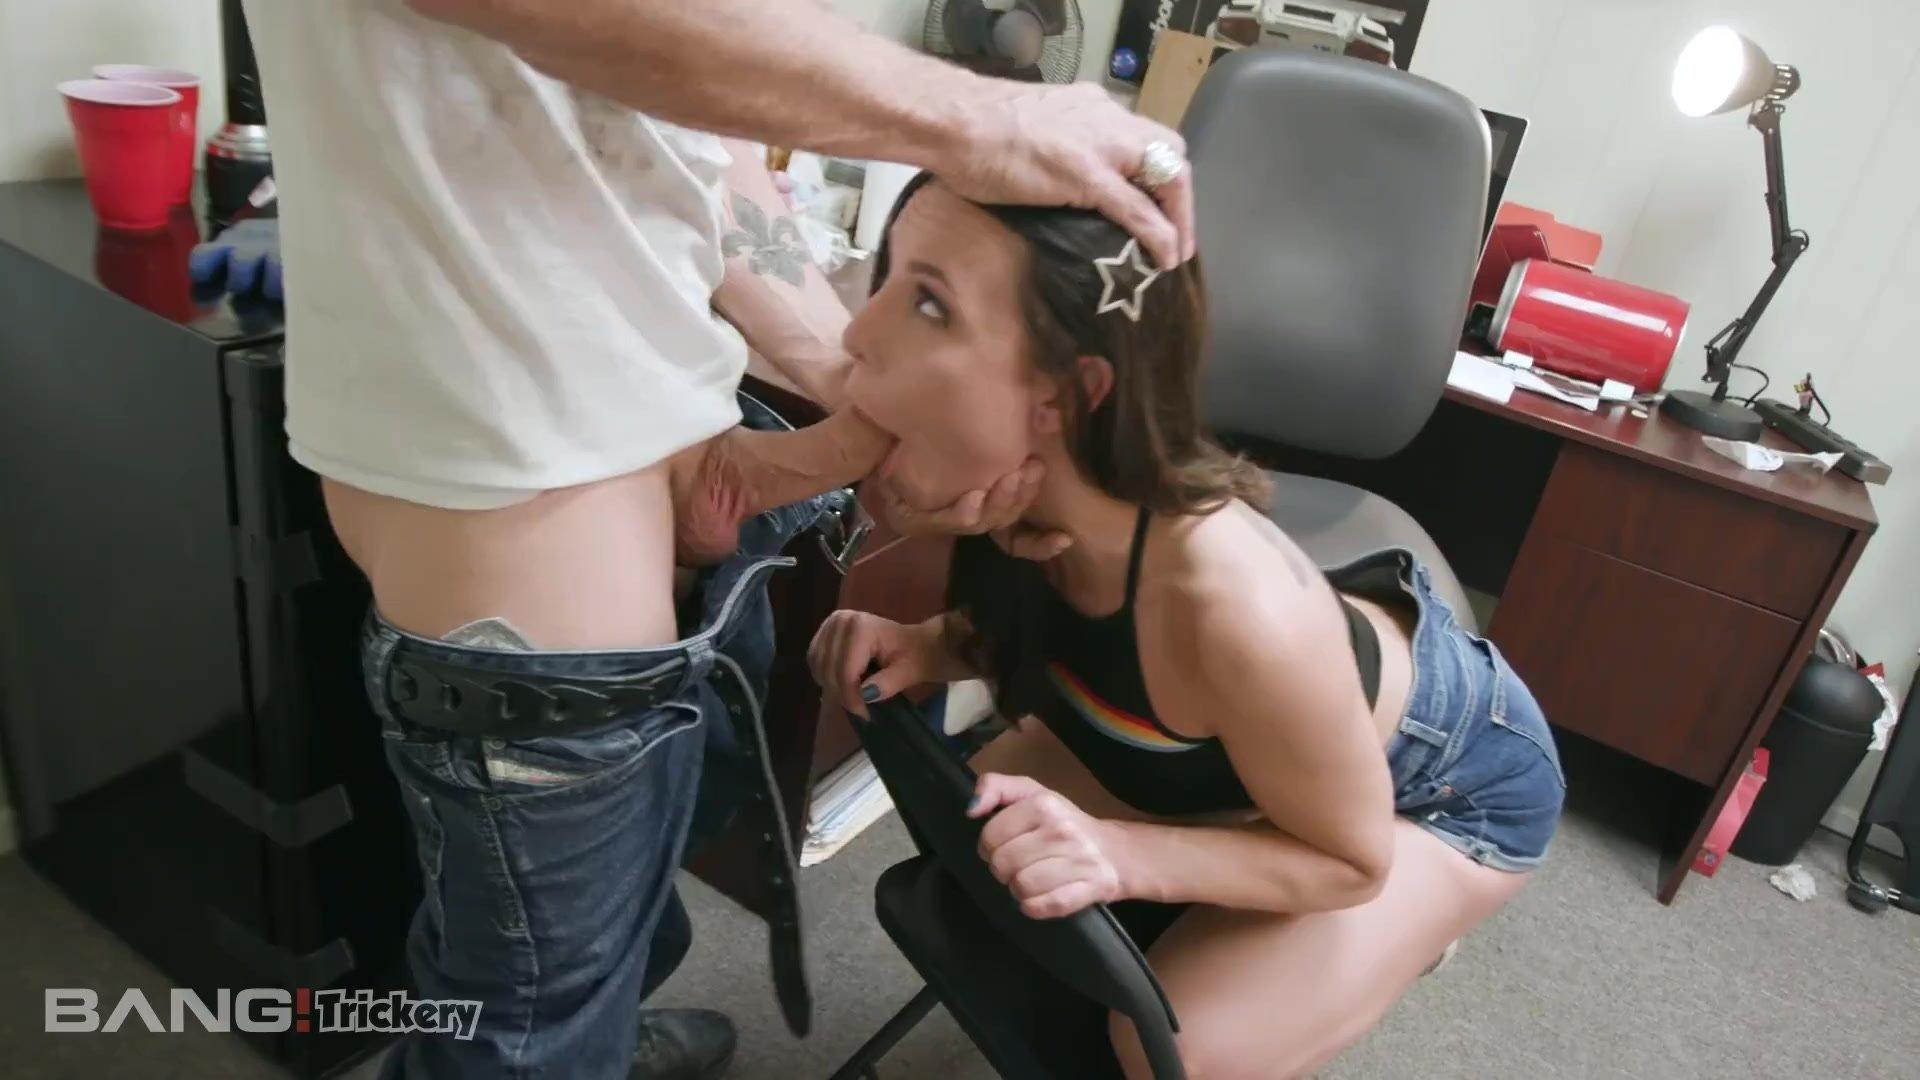 Trickery - Aidra Fox Pays The Mechanic With Her Pussy